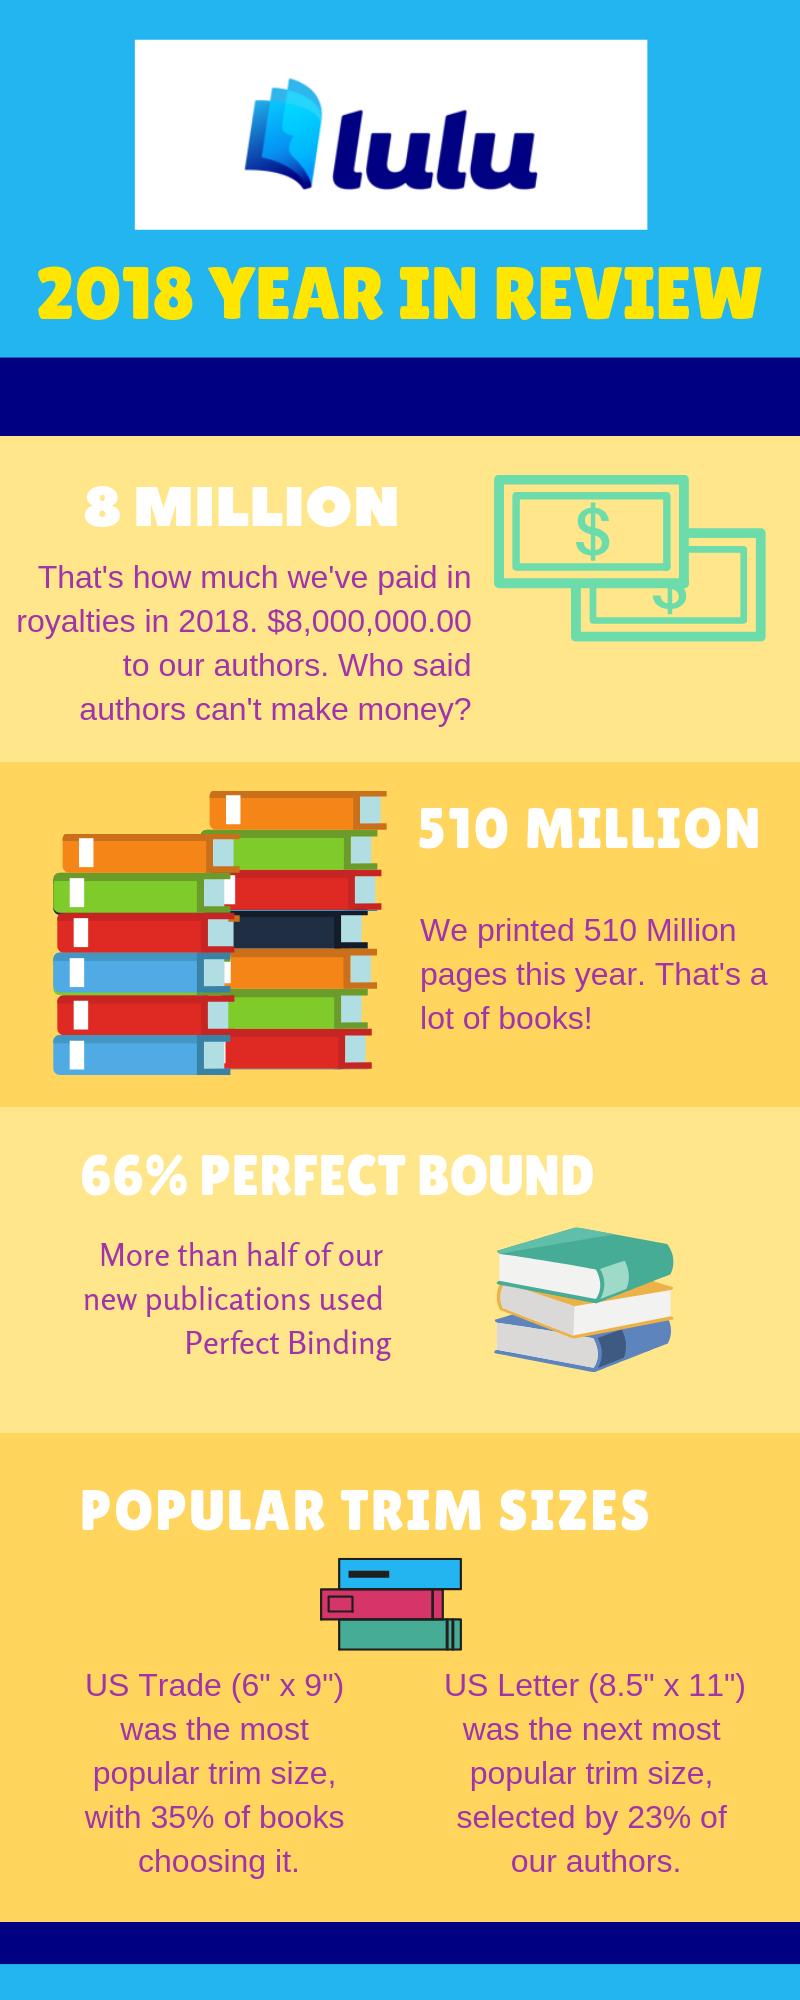 Lulu 2018 Stats Info Graphic